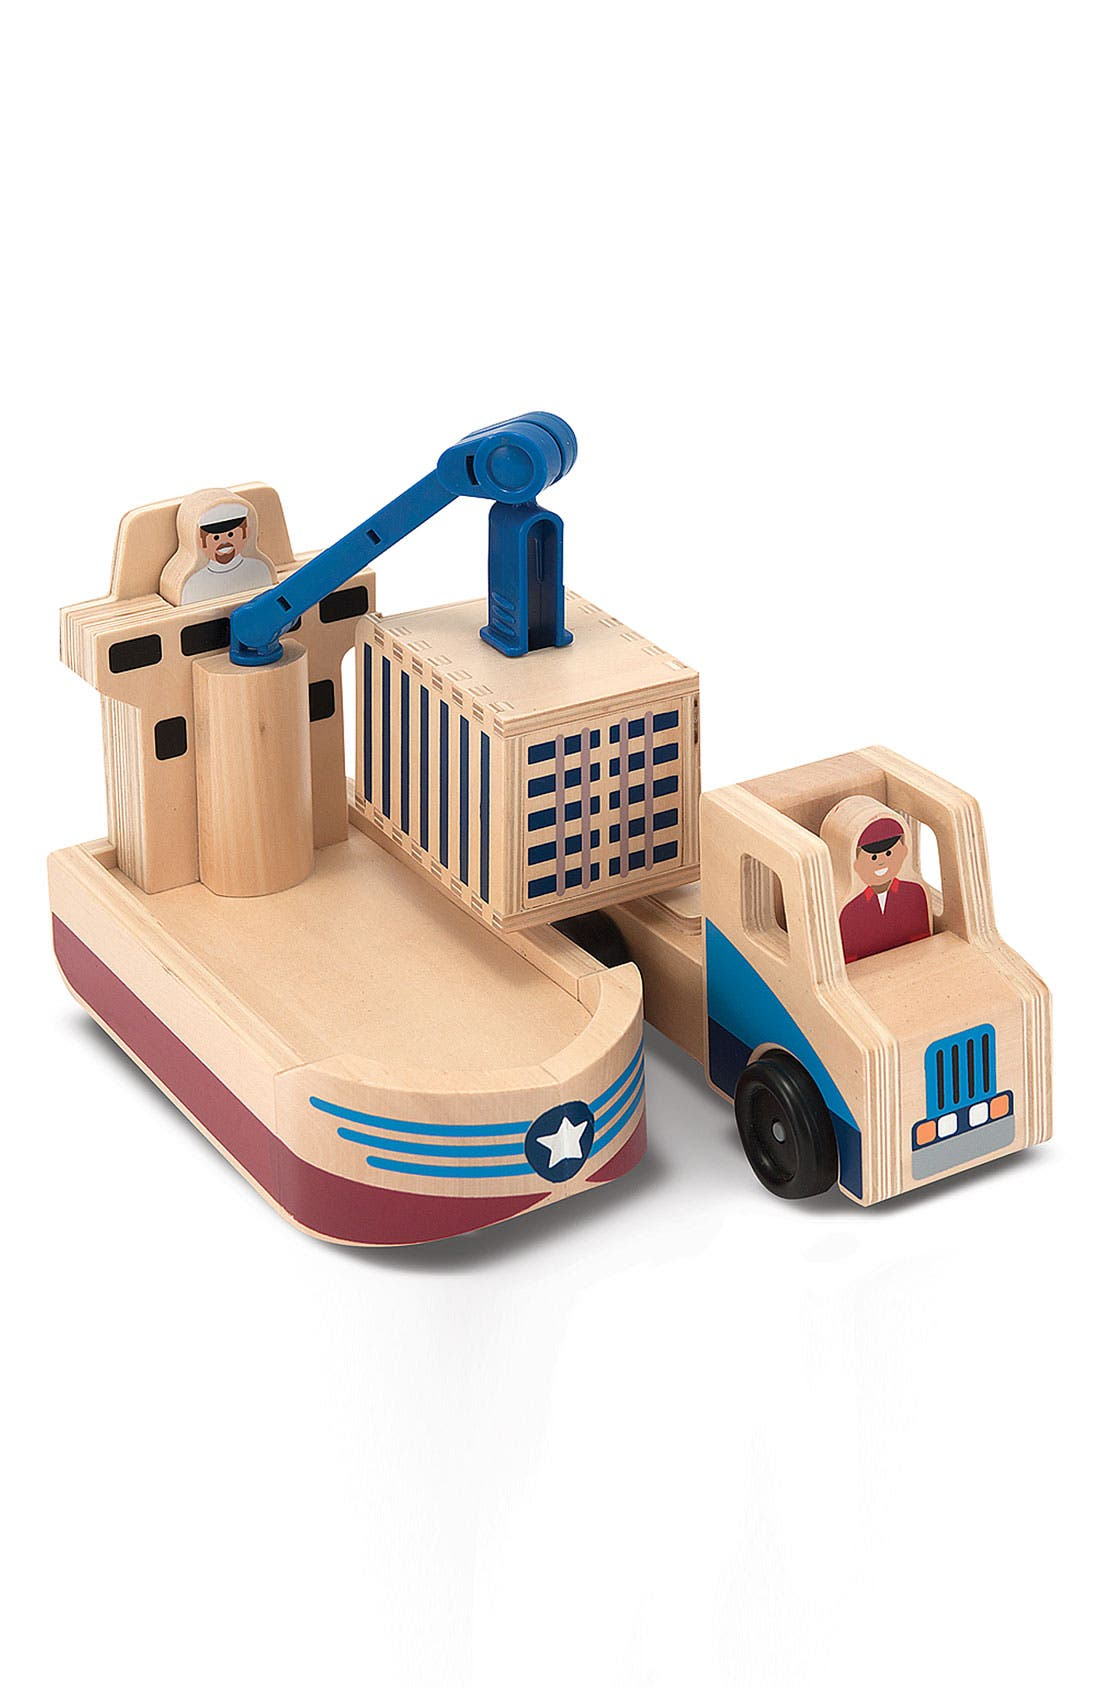 Alternate Image 1 Selected - Melissa & Doug 'Whittle World' Cargo Ship & Truck Wooden Toy